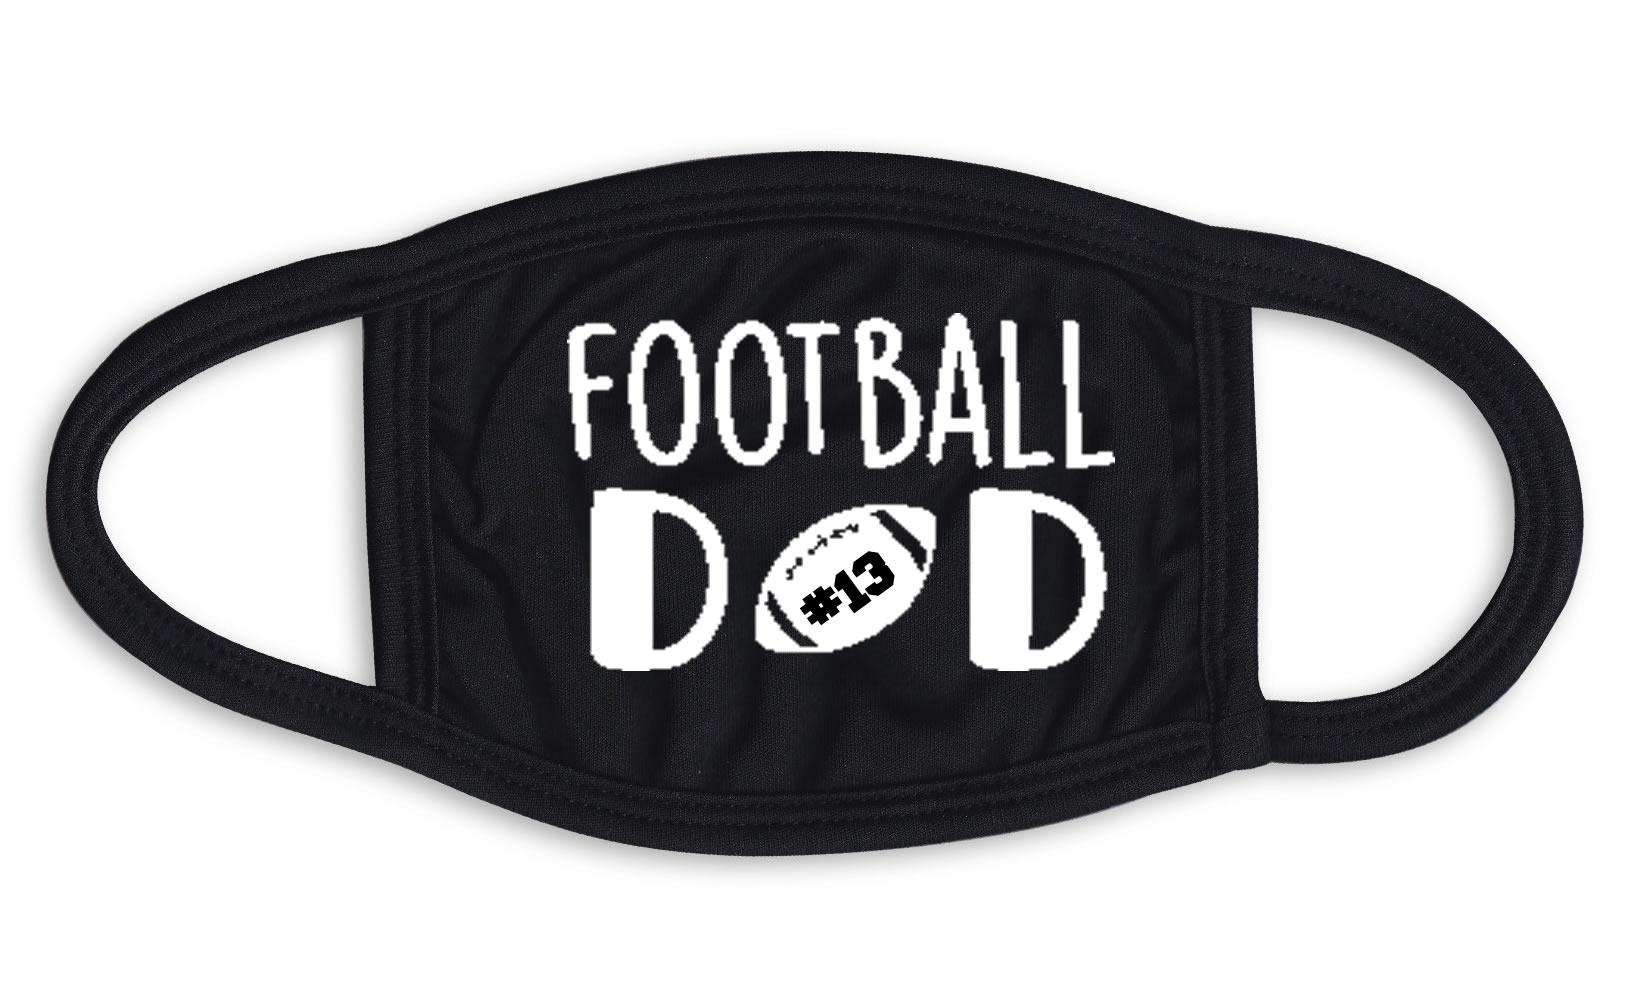 Football Dad Face Mask